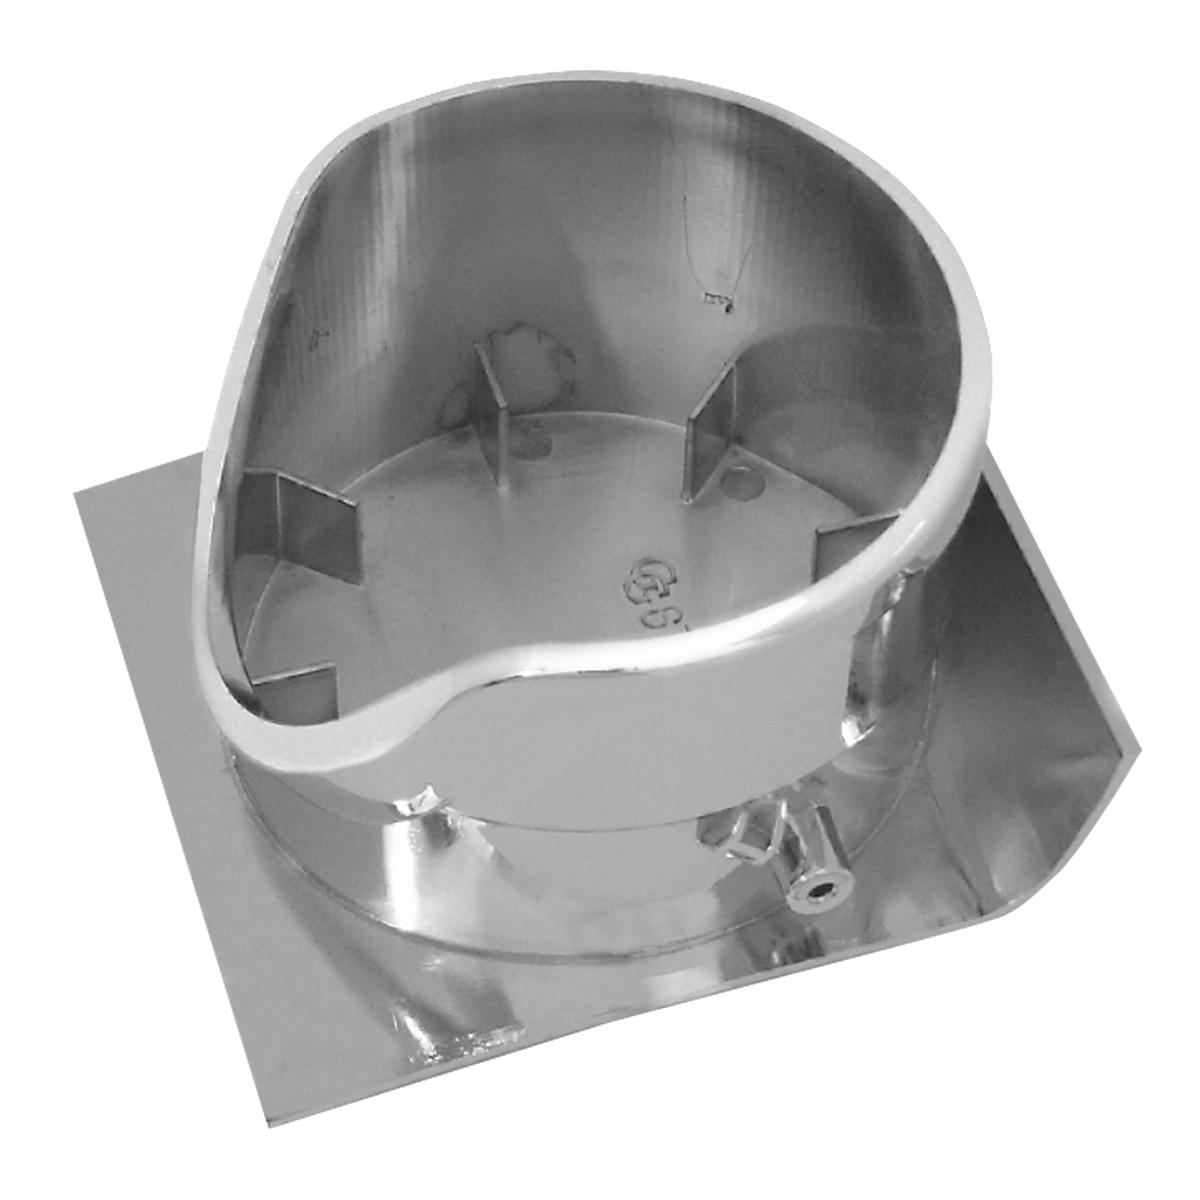 67933 Chrome Plastic Cup Holder for FL Century